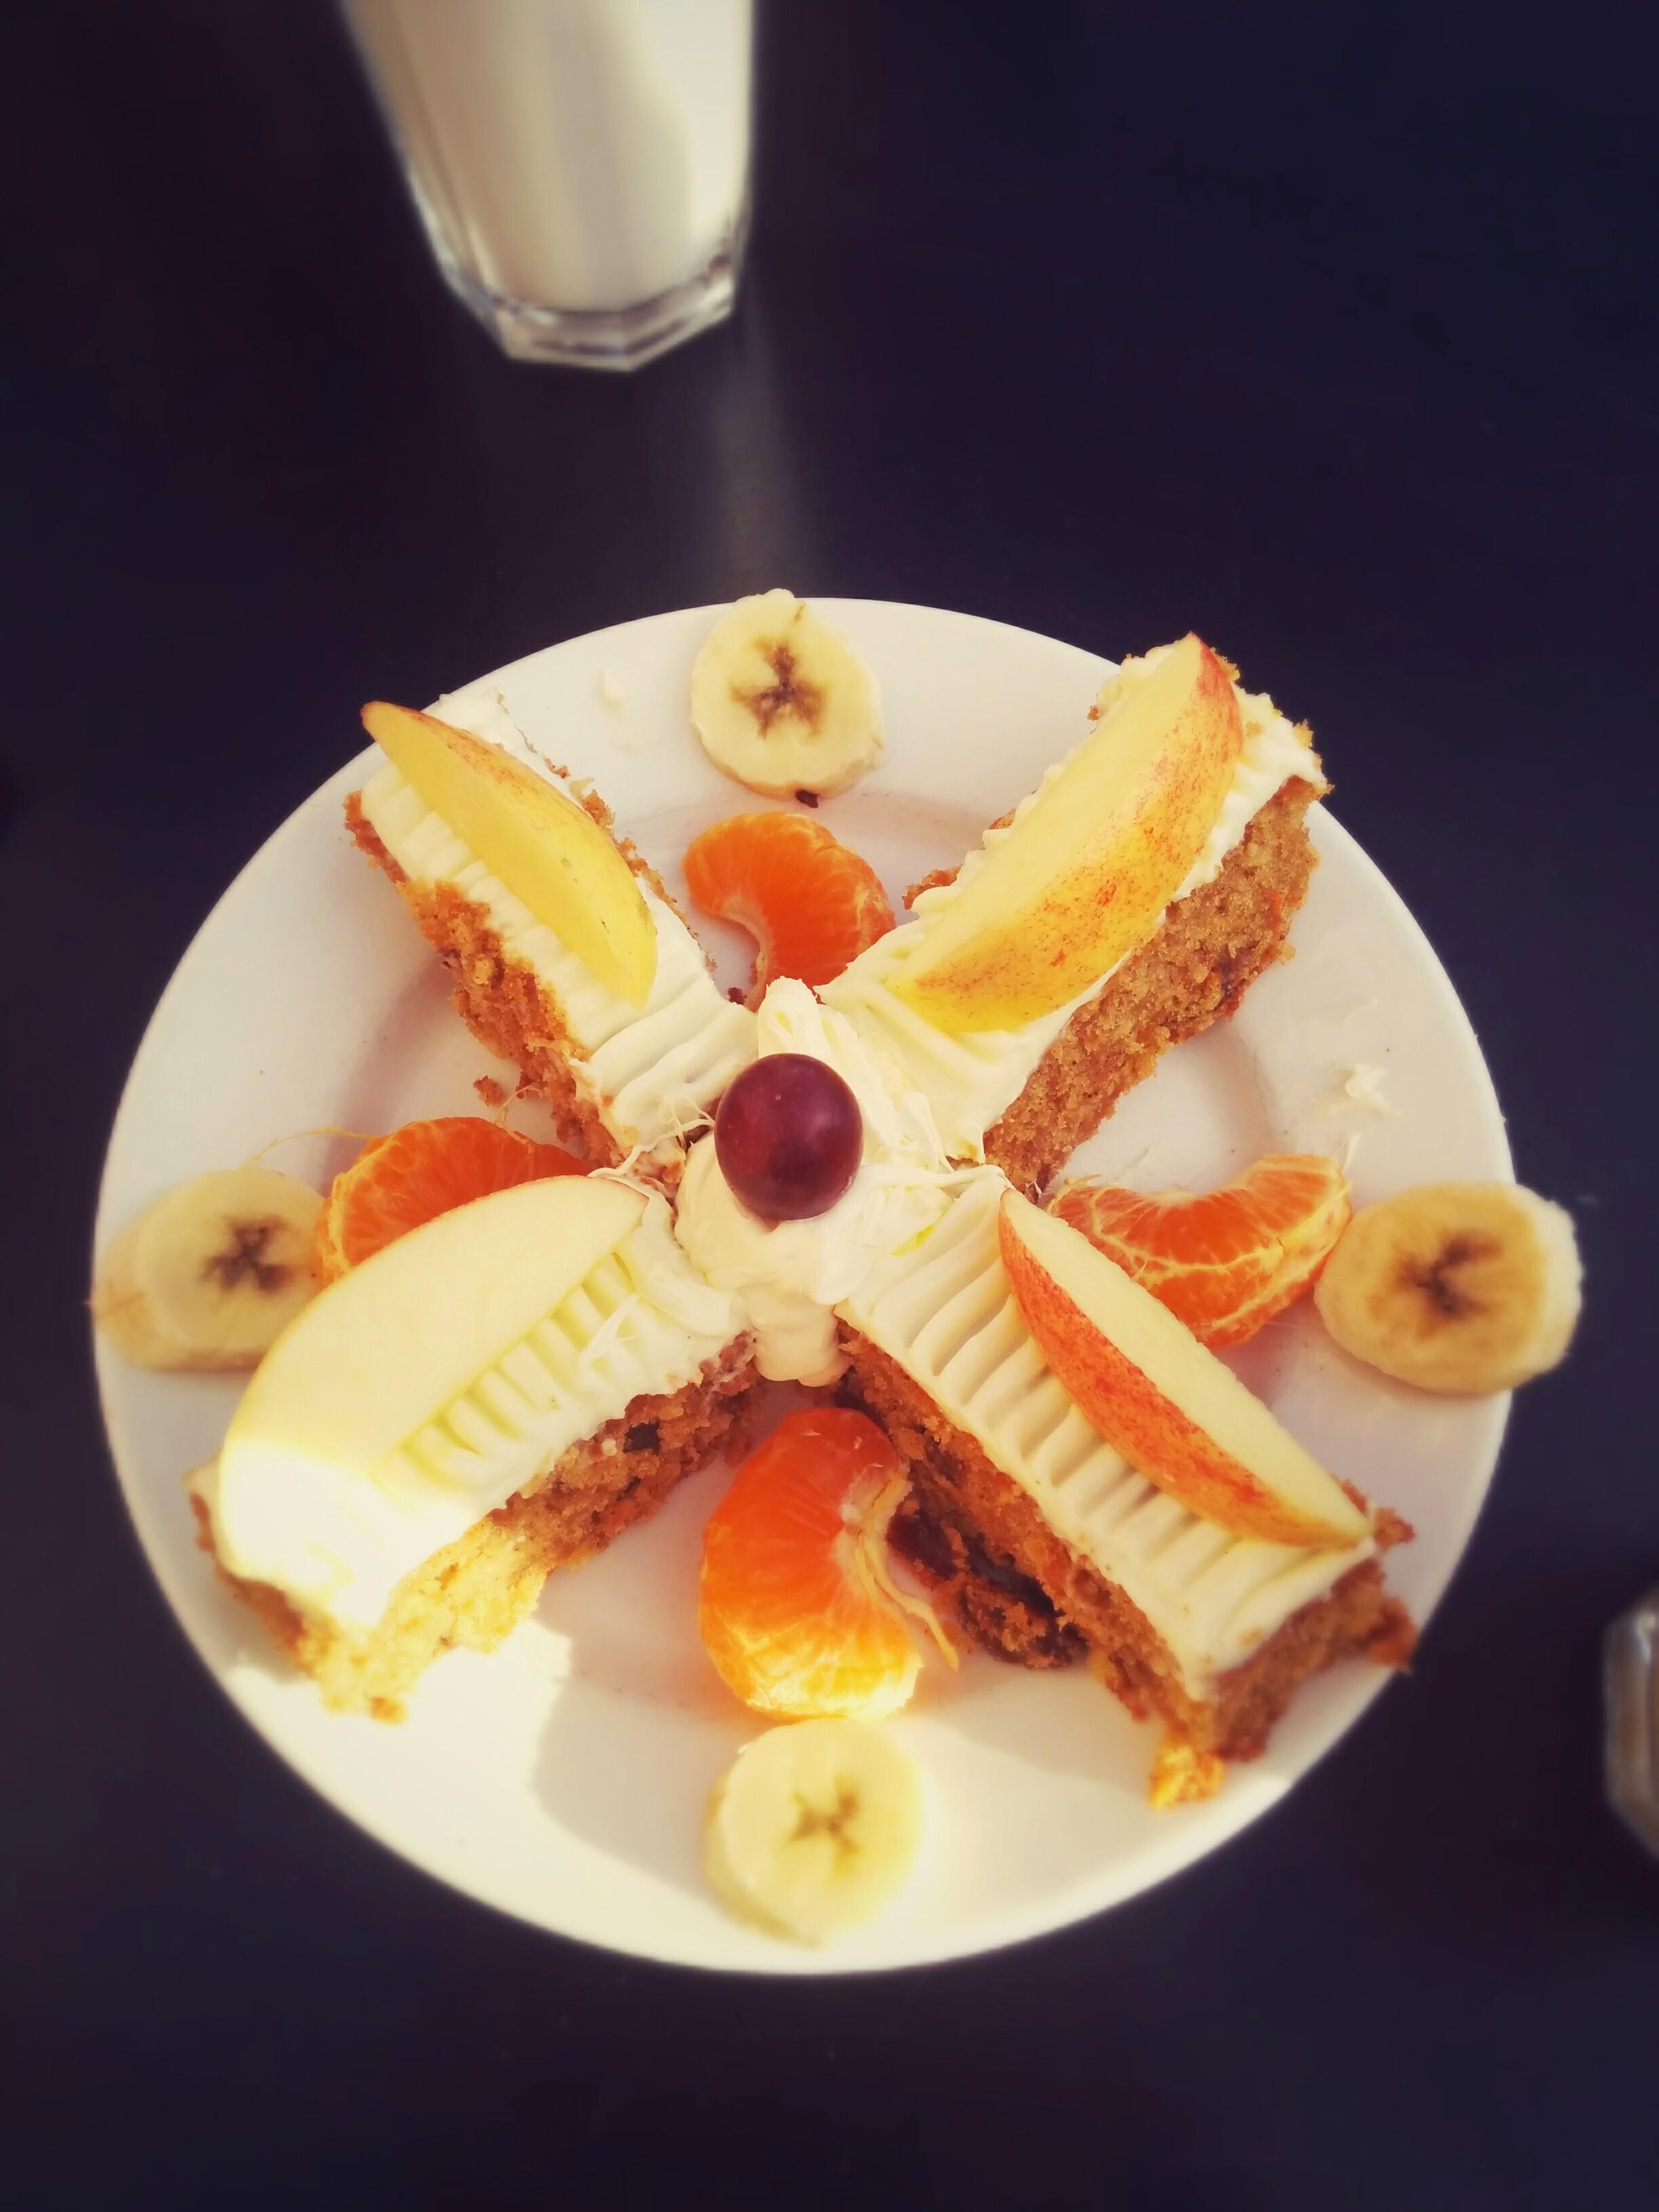 Giving-life-colour-carrot-cake-close